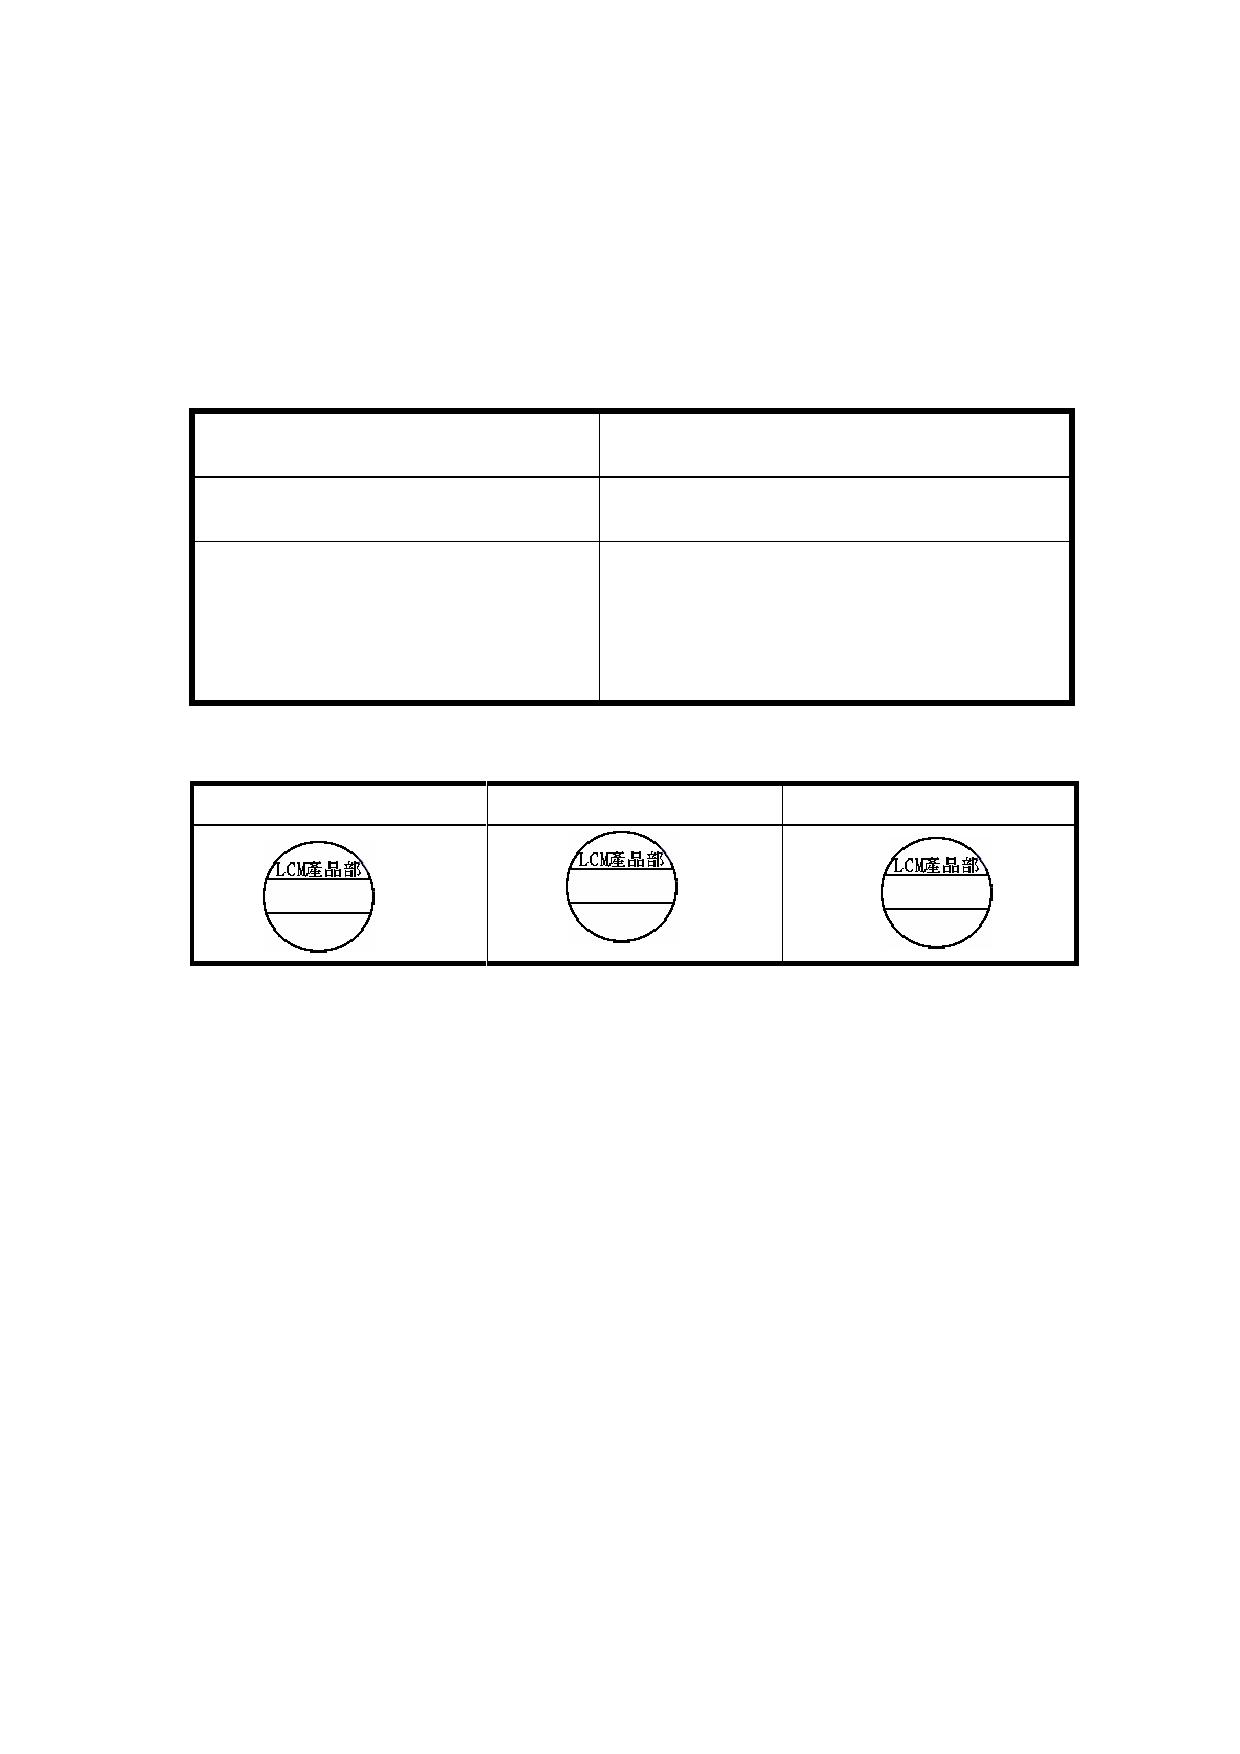 I3002-7IXN2440A دیتاشیت PDF